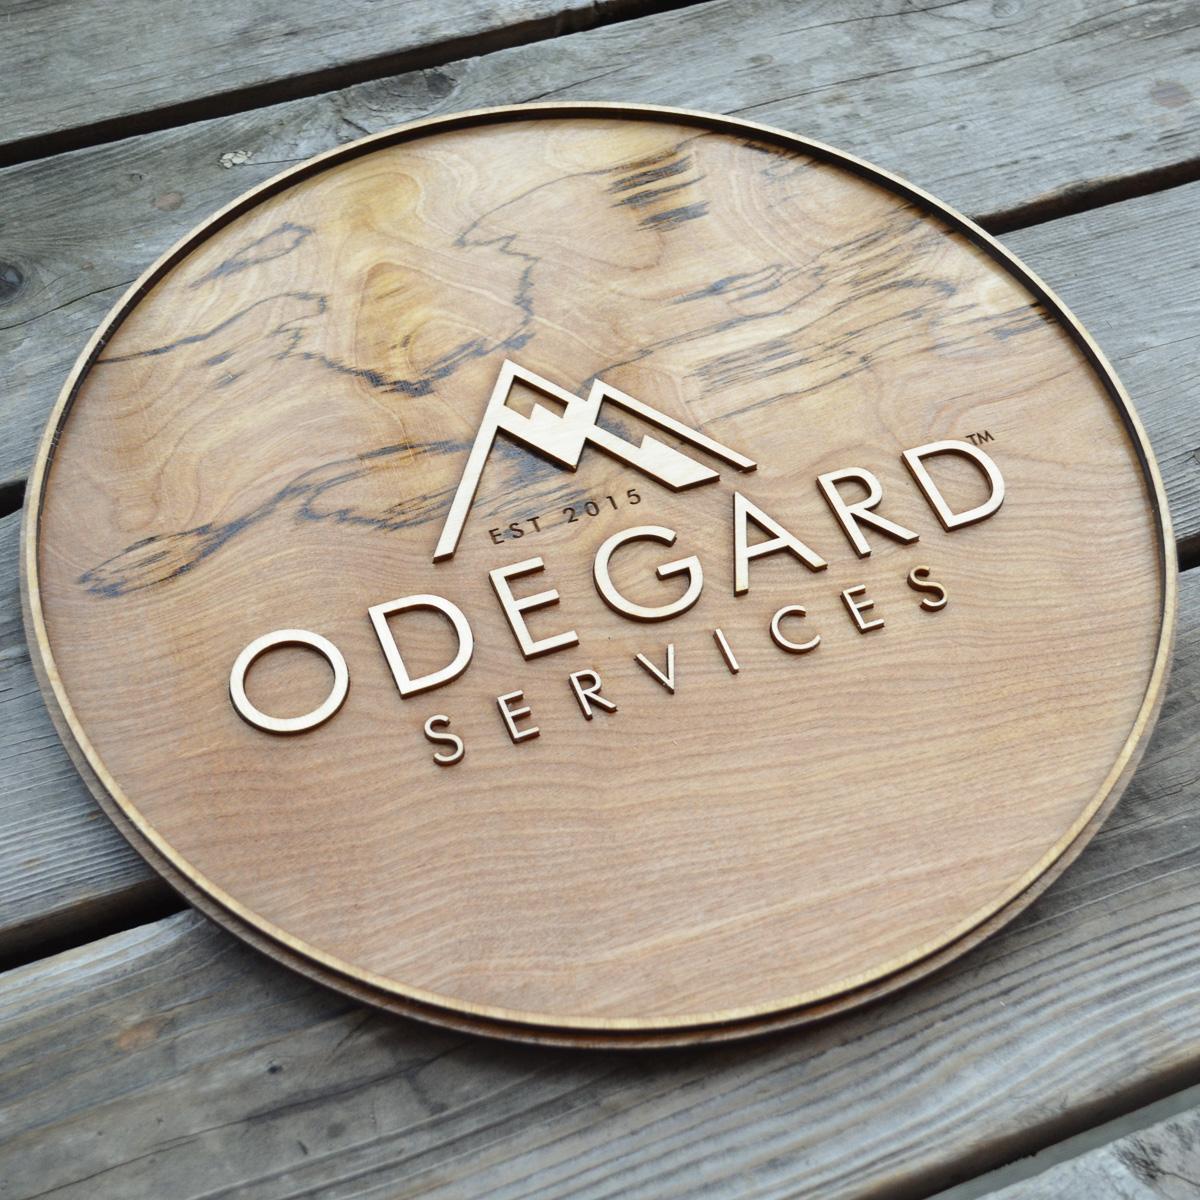 Emily Longbrake Odegard Services Sign 2